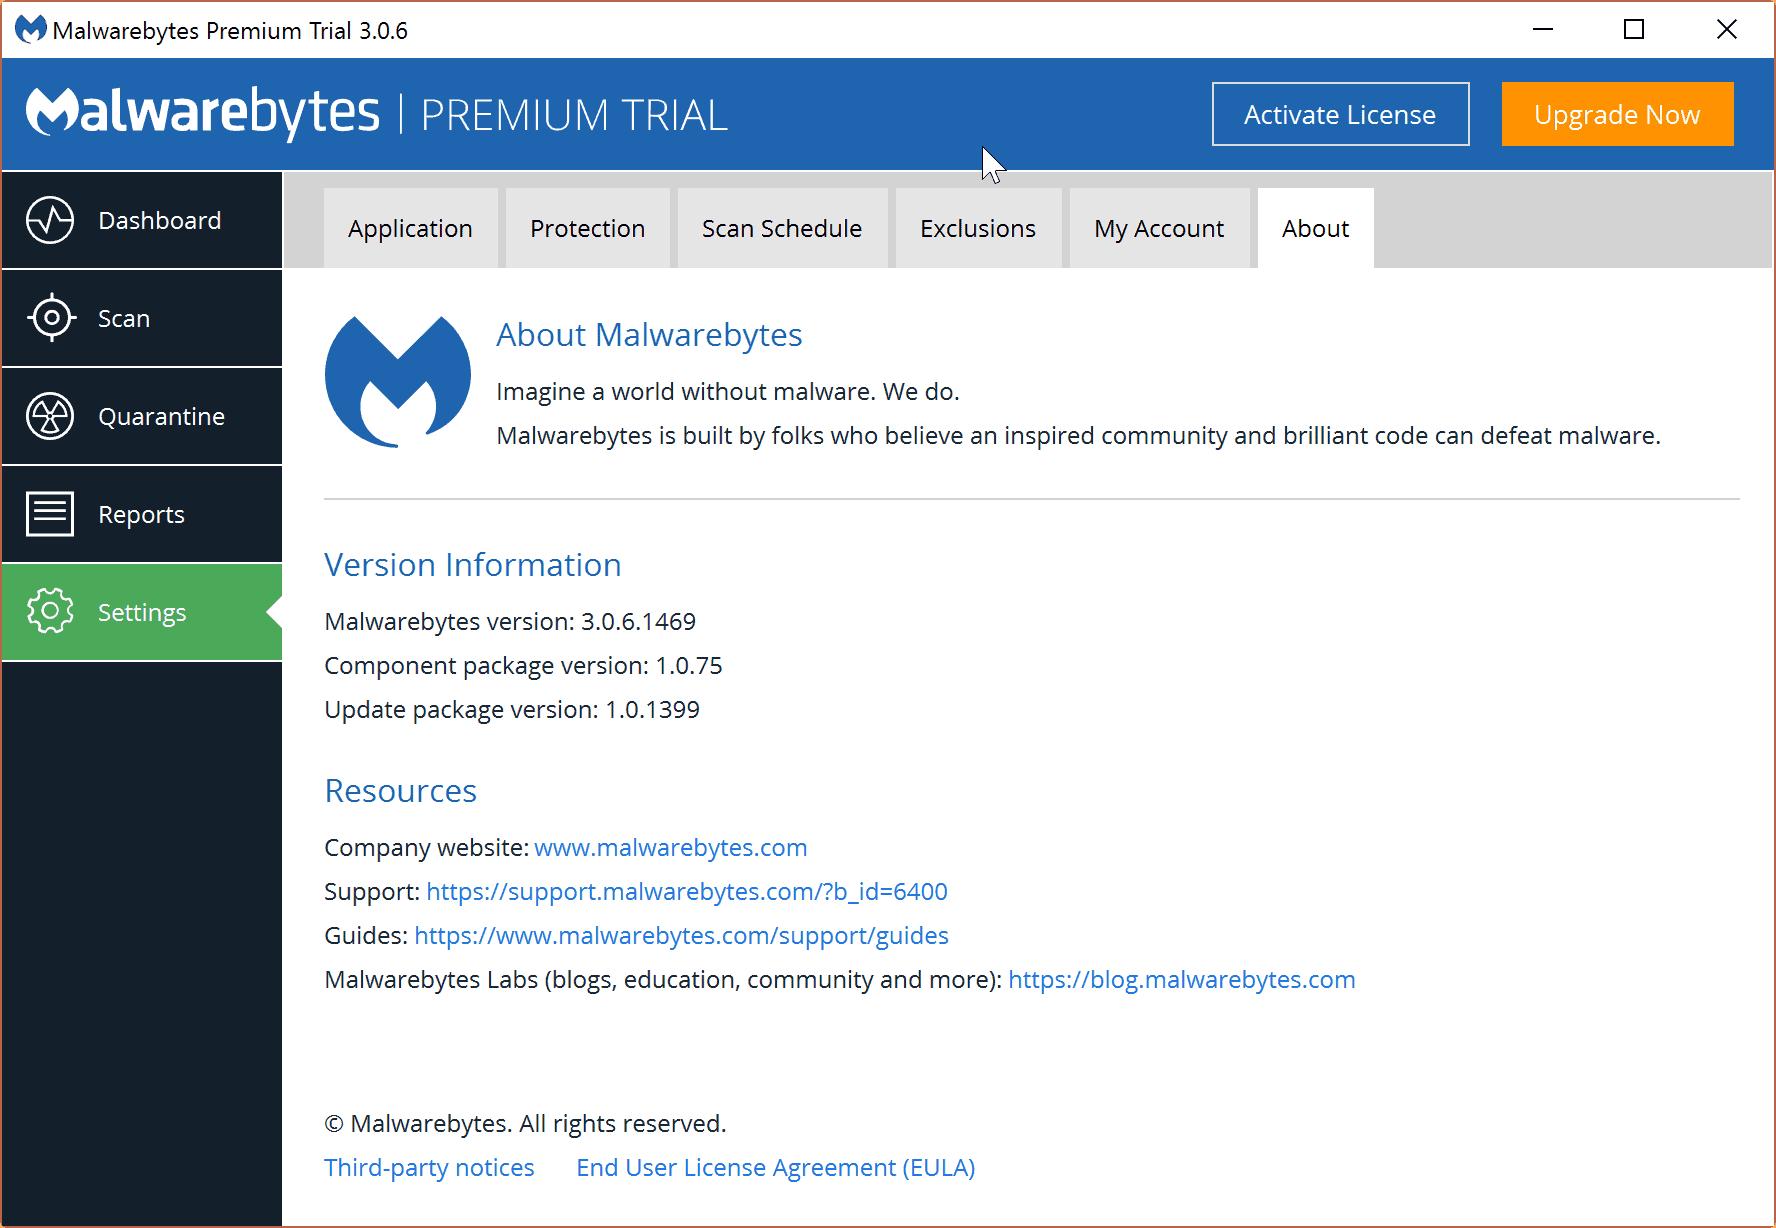 malwarebytes 3.0.6 component 1.0.75 update